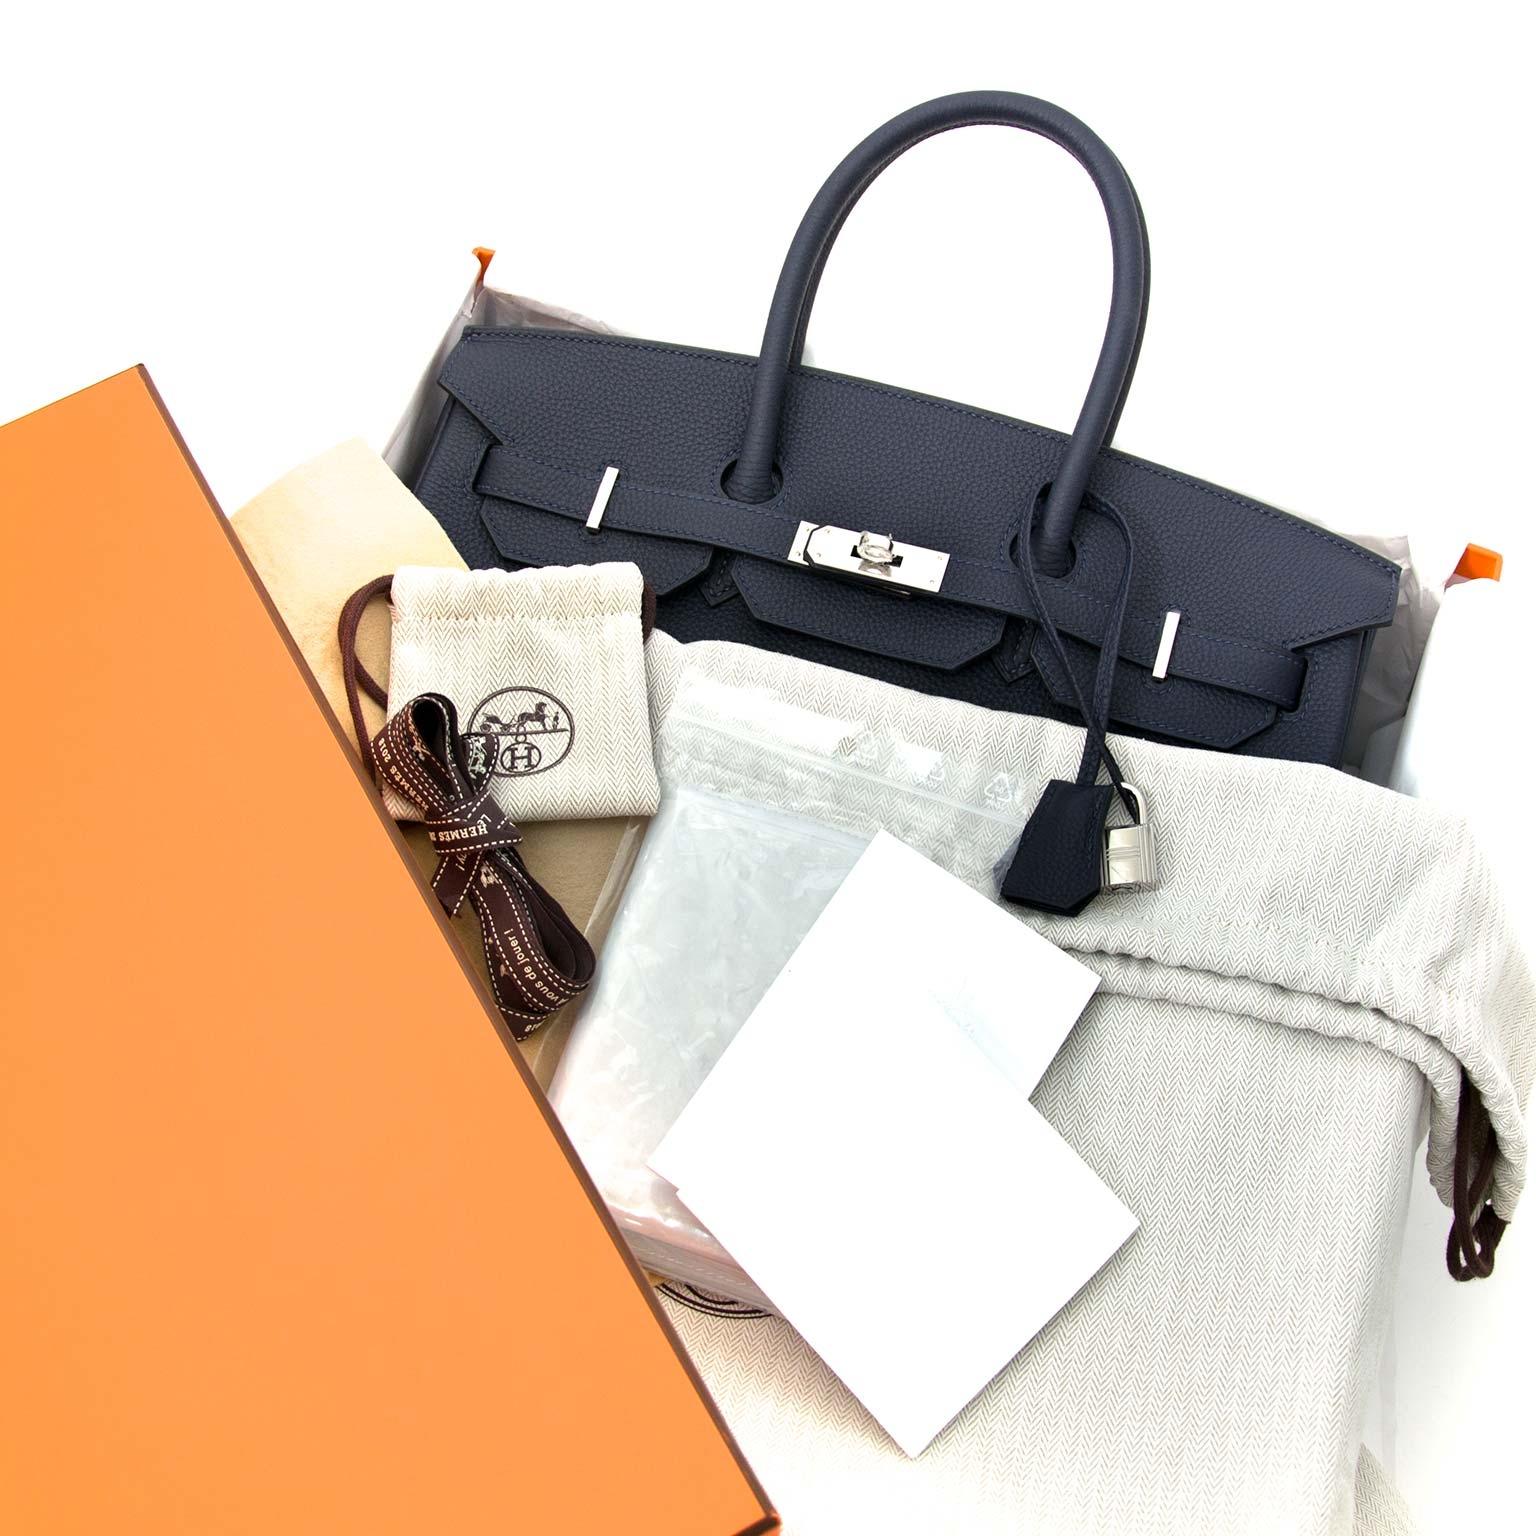 Hermès Birkin 35 Togo Bleu Nuit PHW available worldwide shipping